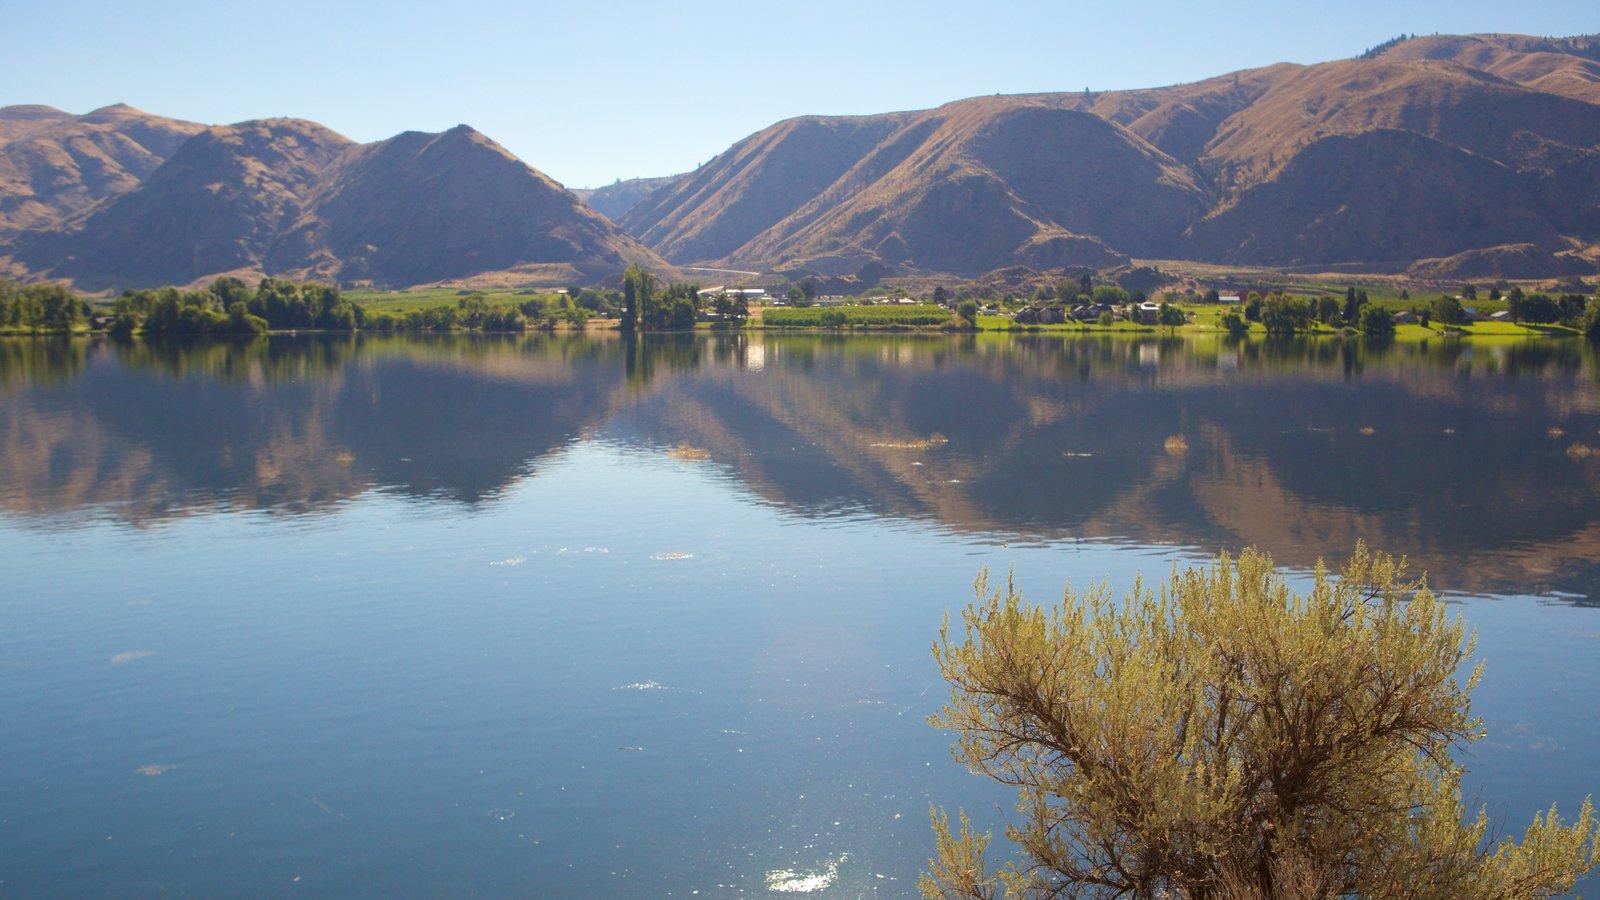 Wenatchee - Lake Chelan caracterizando montanhas e um lago ou charco